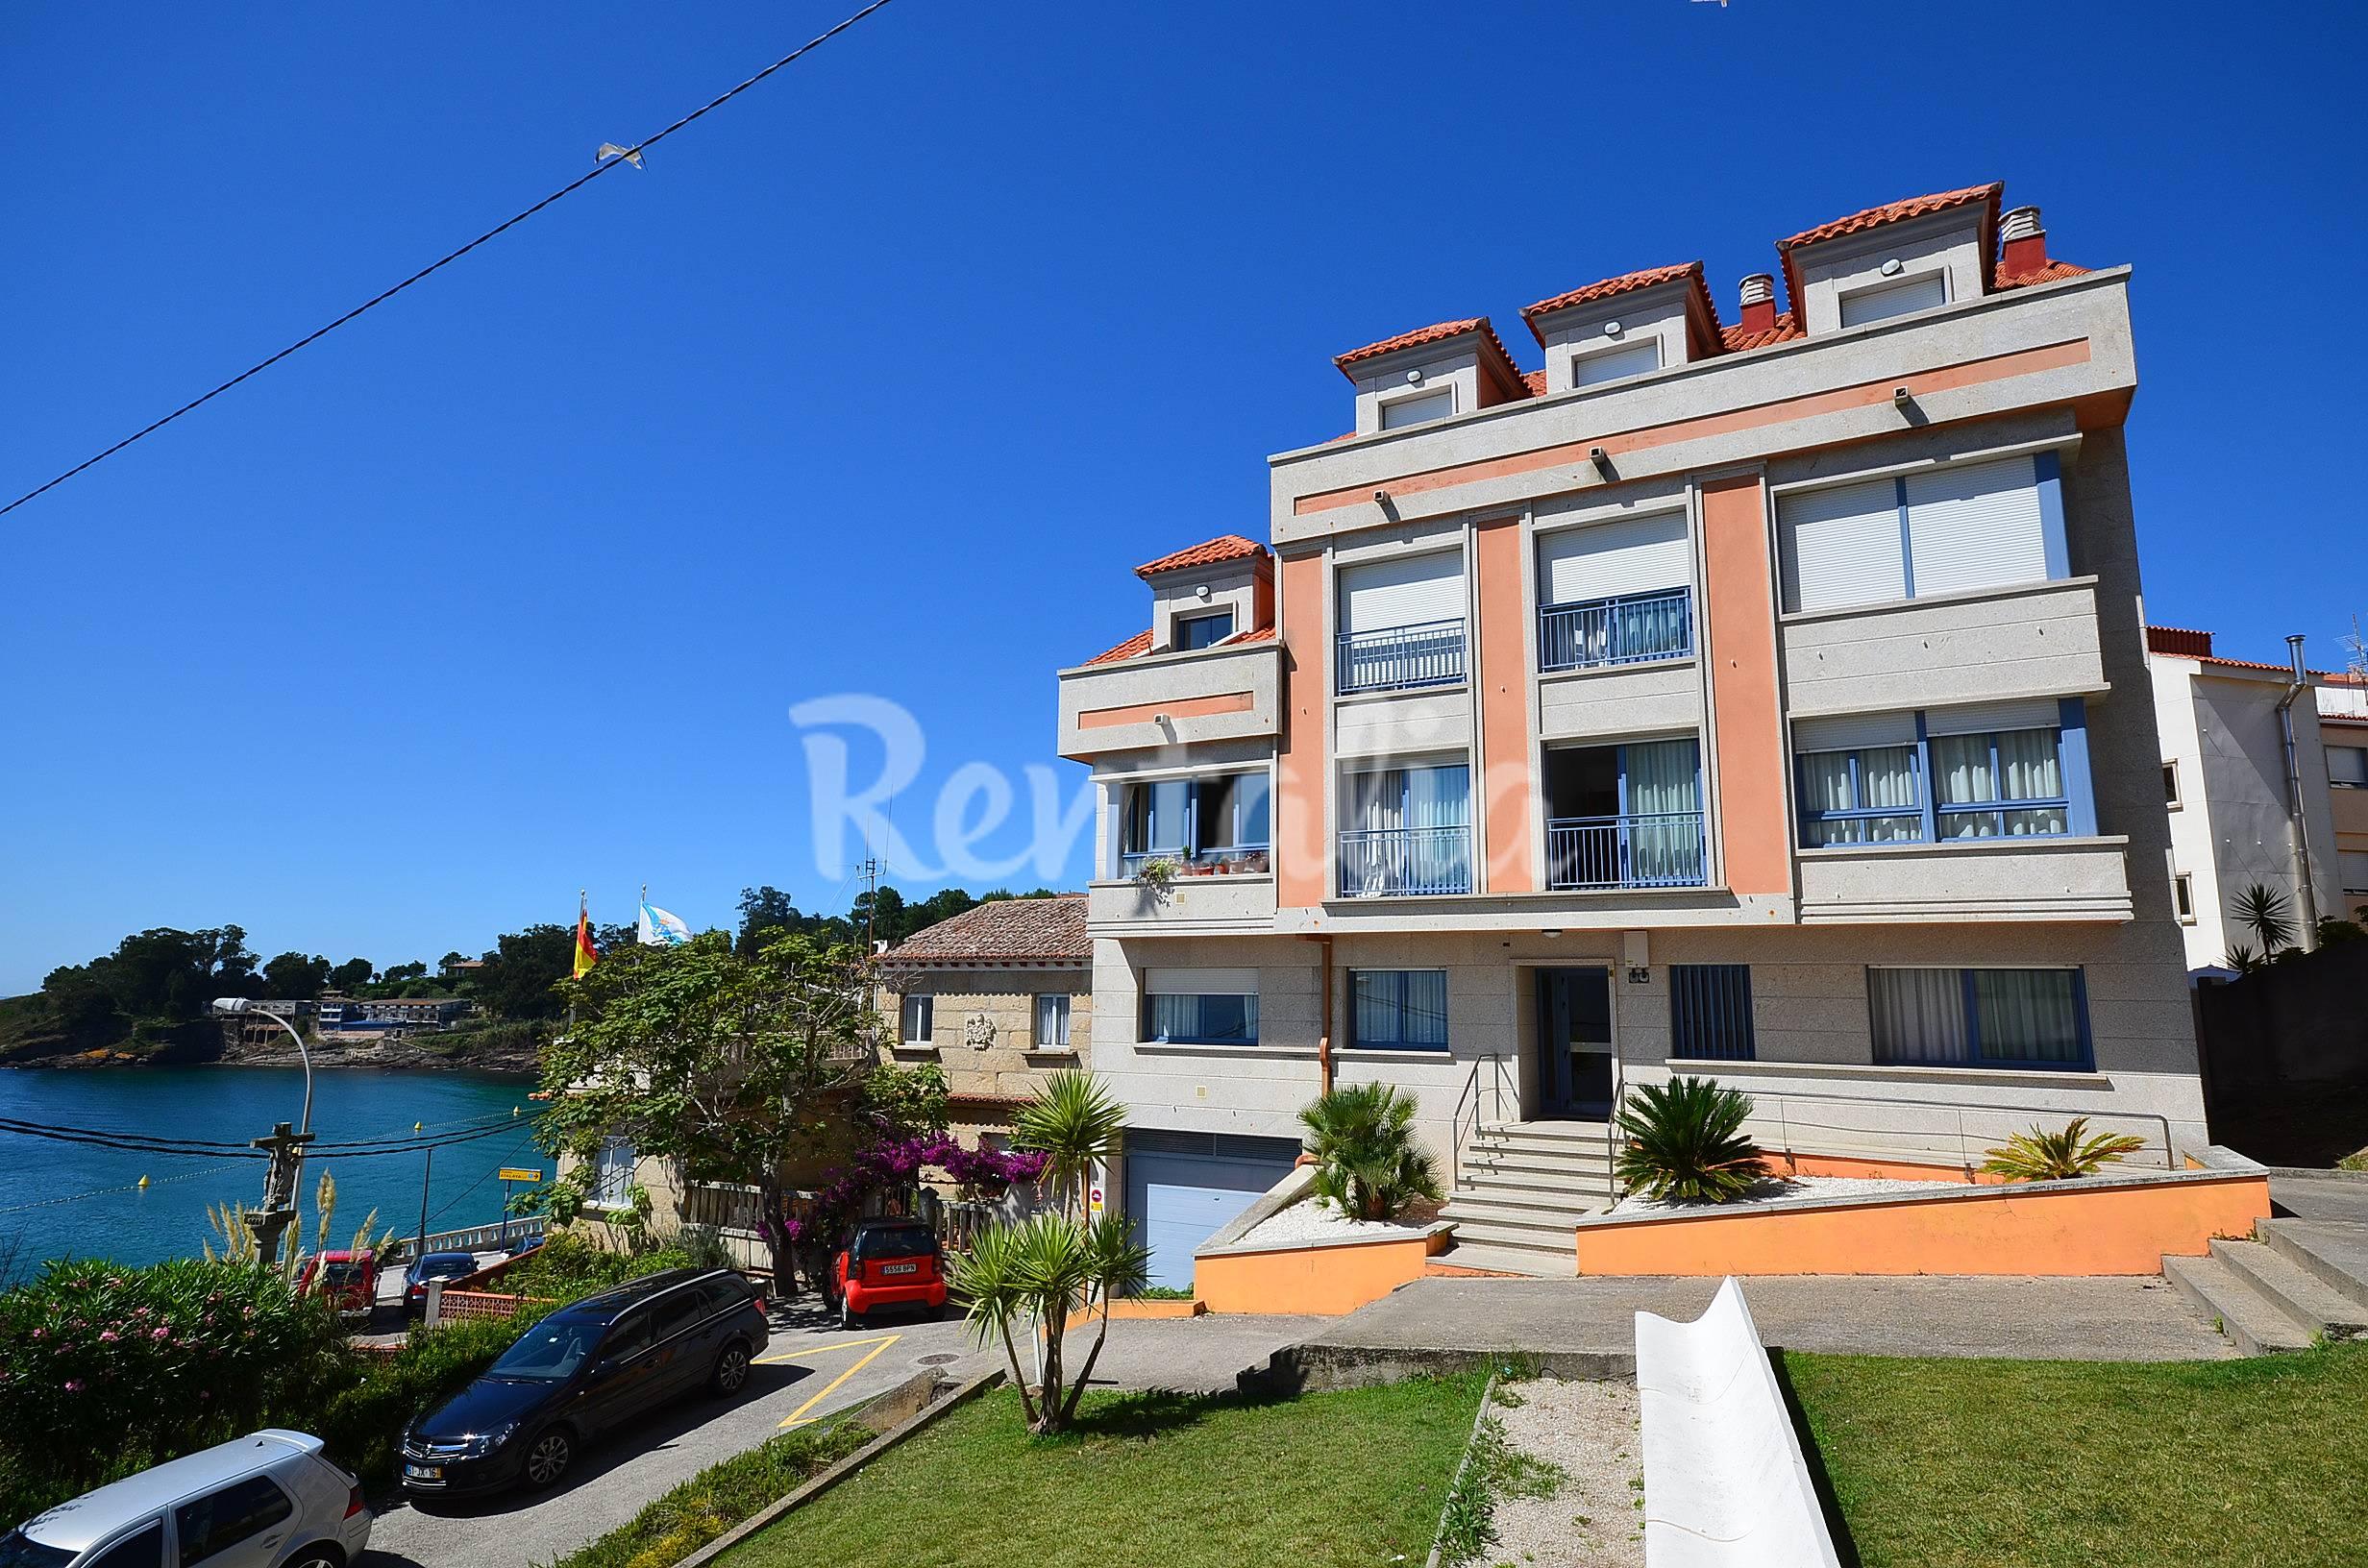 Apartamentos para vacaciones a 100 m de la playa portonovo sanxenxo sangenjo pontevedra - Apartamentos rias bajas ...